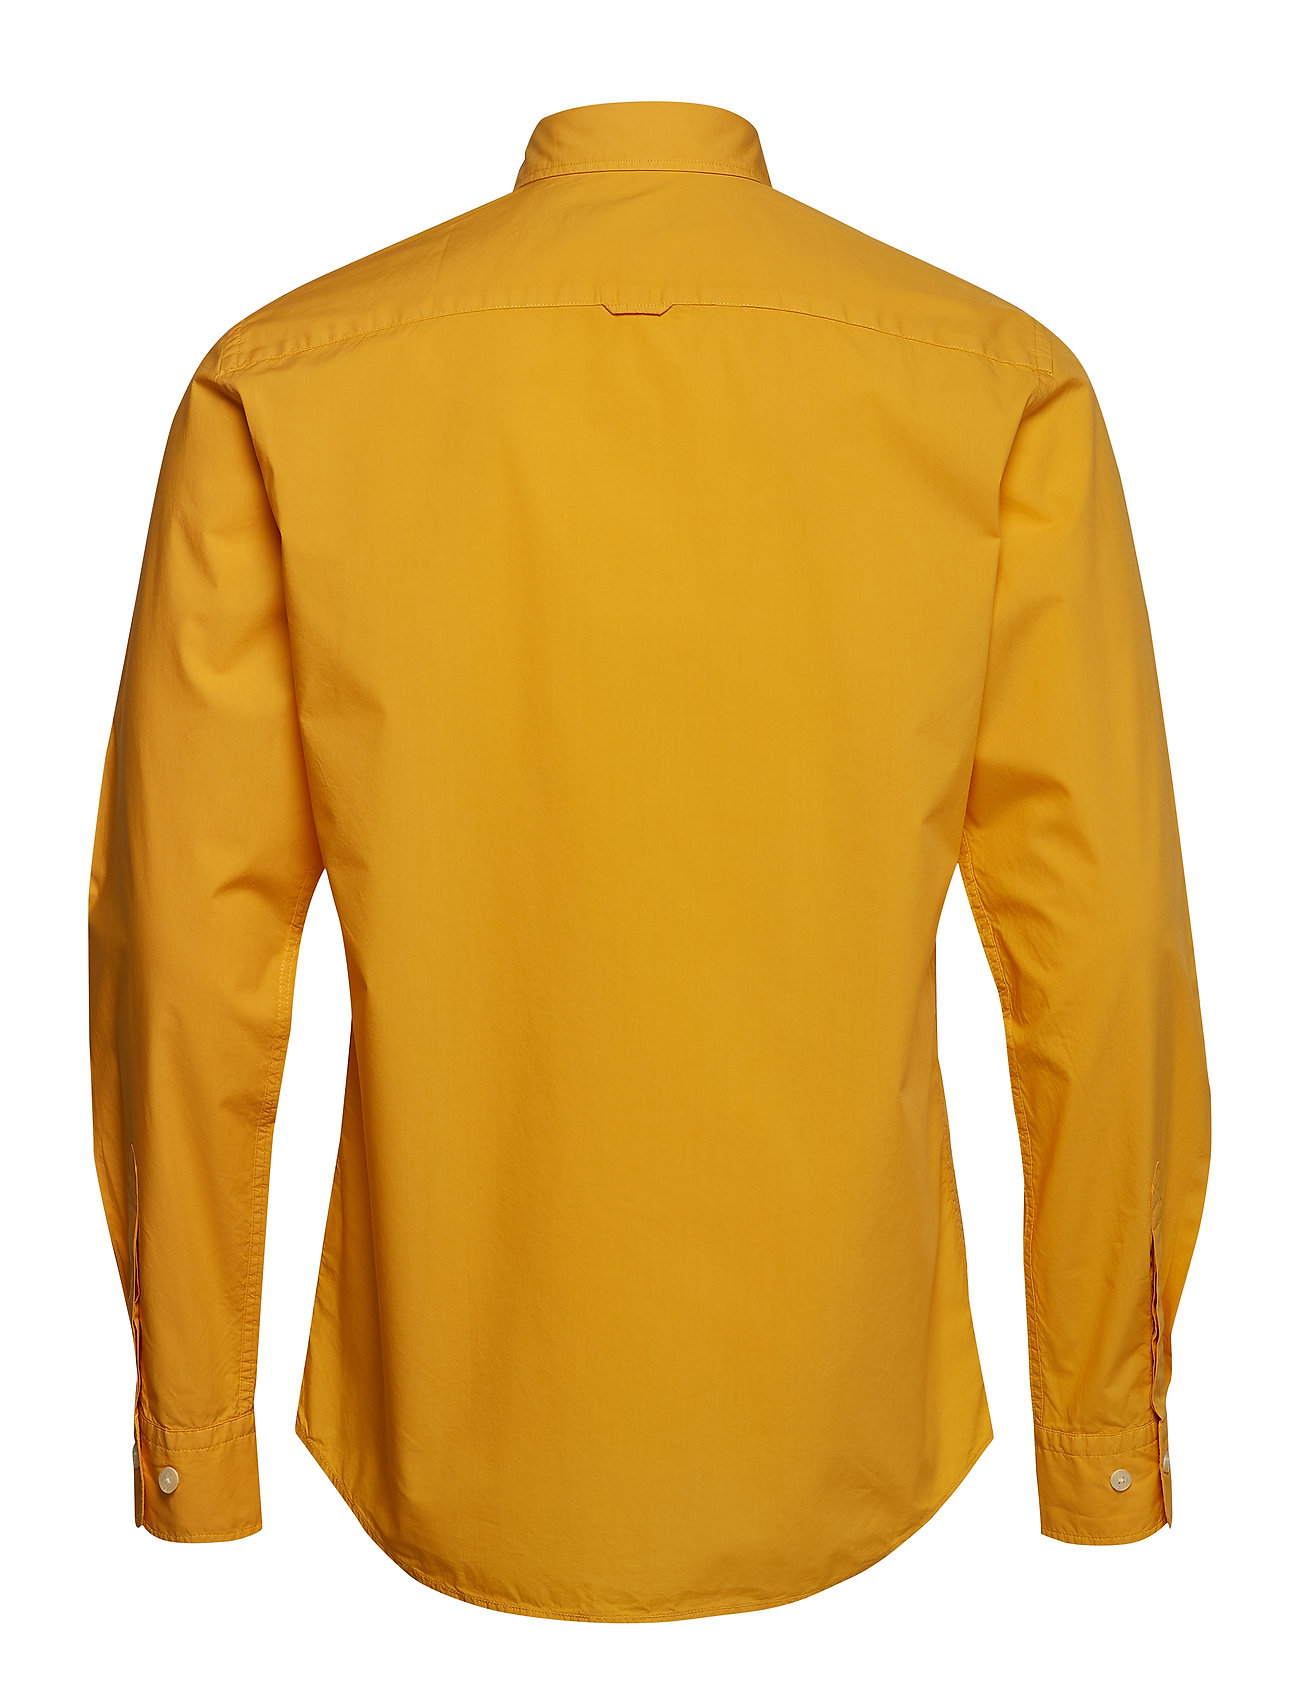 Niccolo Niccolo Collar Classic Classic ShirtyellowMorris rBCexdoW